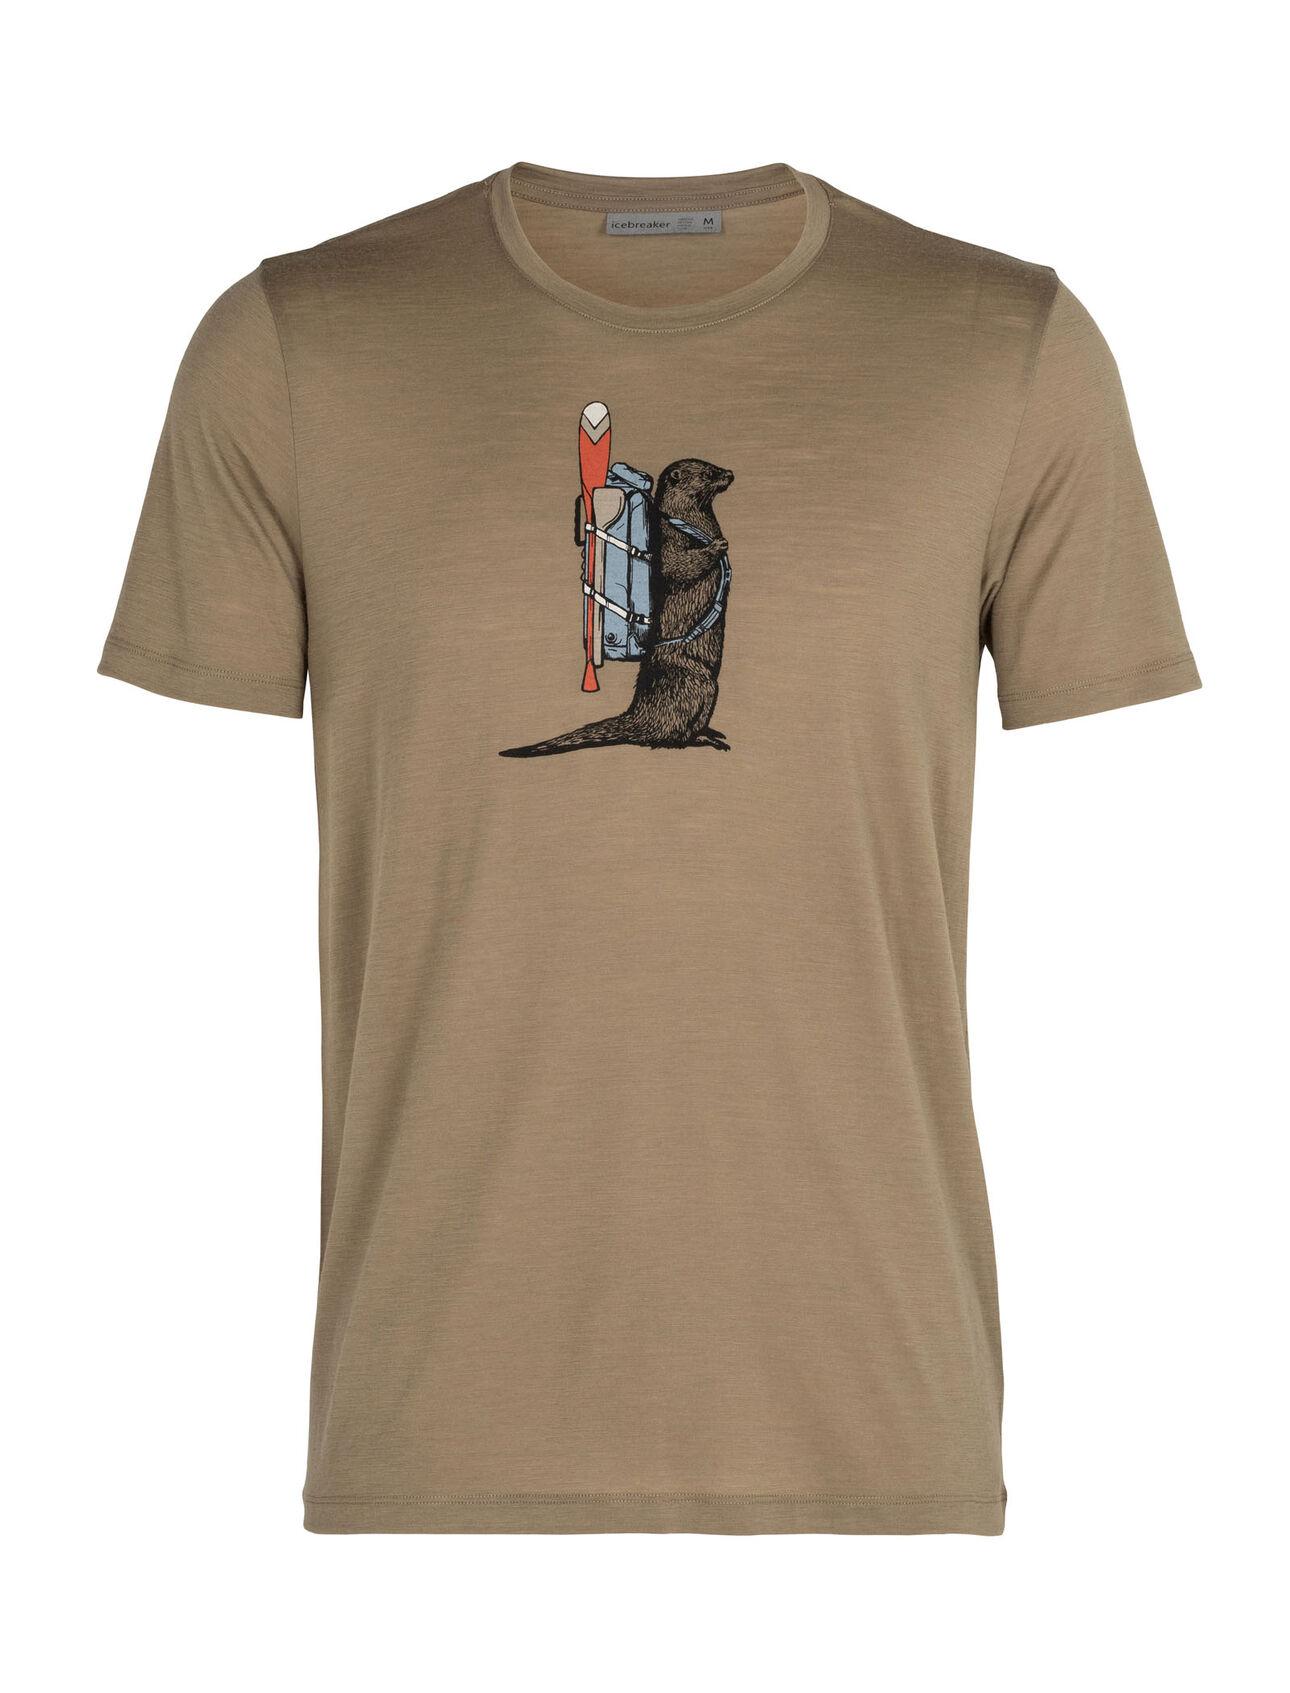 Merino Tech Lite Short Sleeve Crewe T-Shirt Otter Paddle